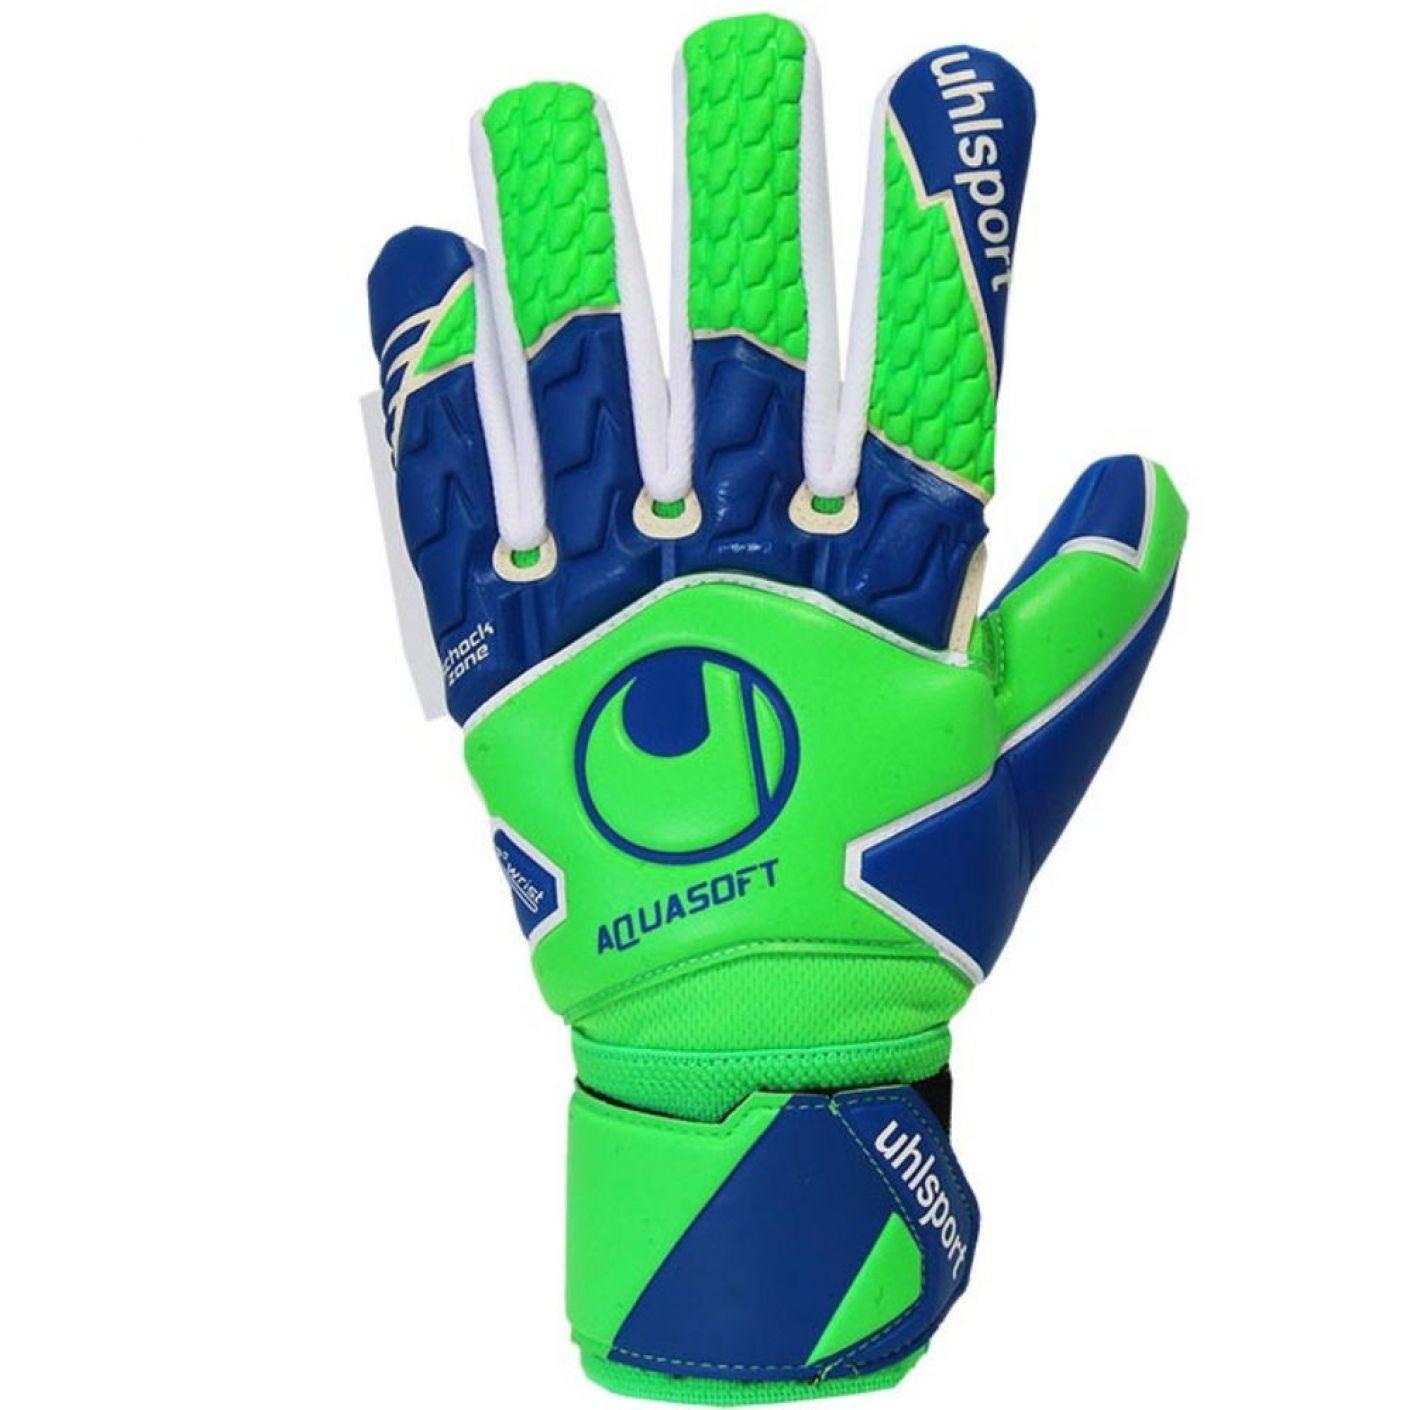 UHLSPORT AQUASOFT HN Keepershandschoenen Groen Blauw